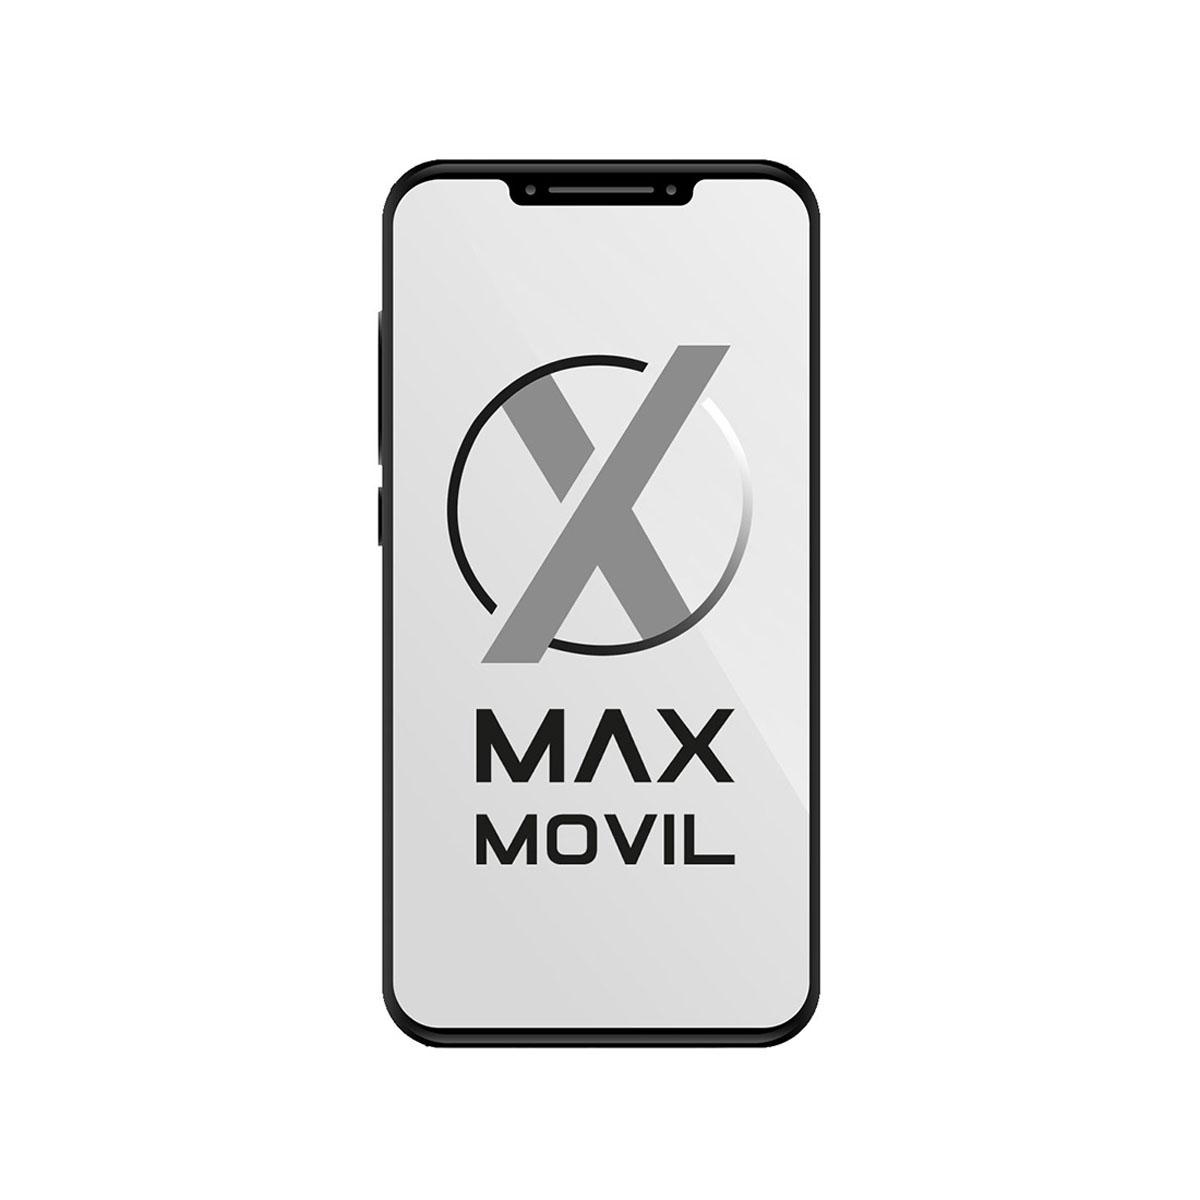 Auricular manos libres Sony MH410c negro · MaxMovil ⓴⓳